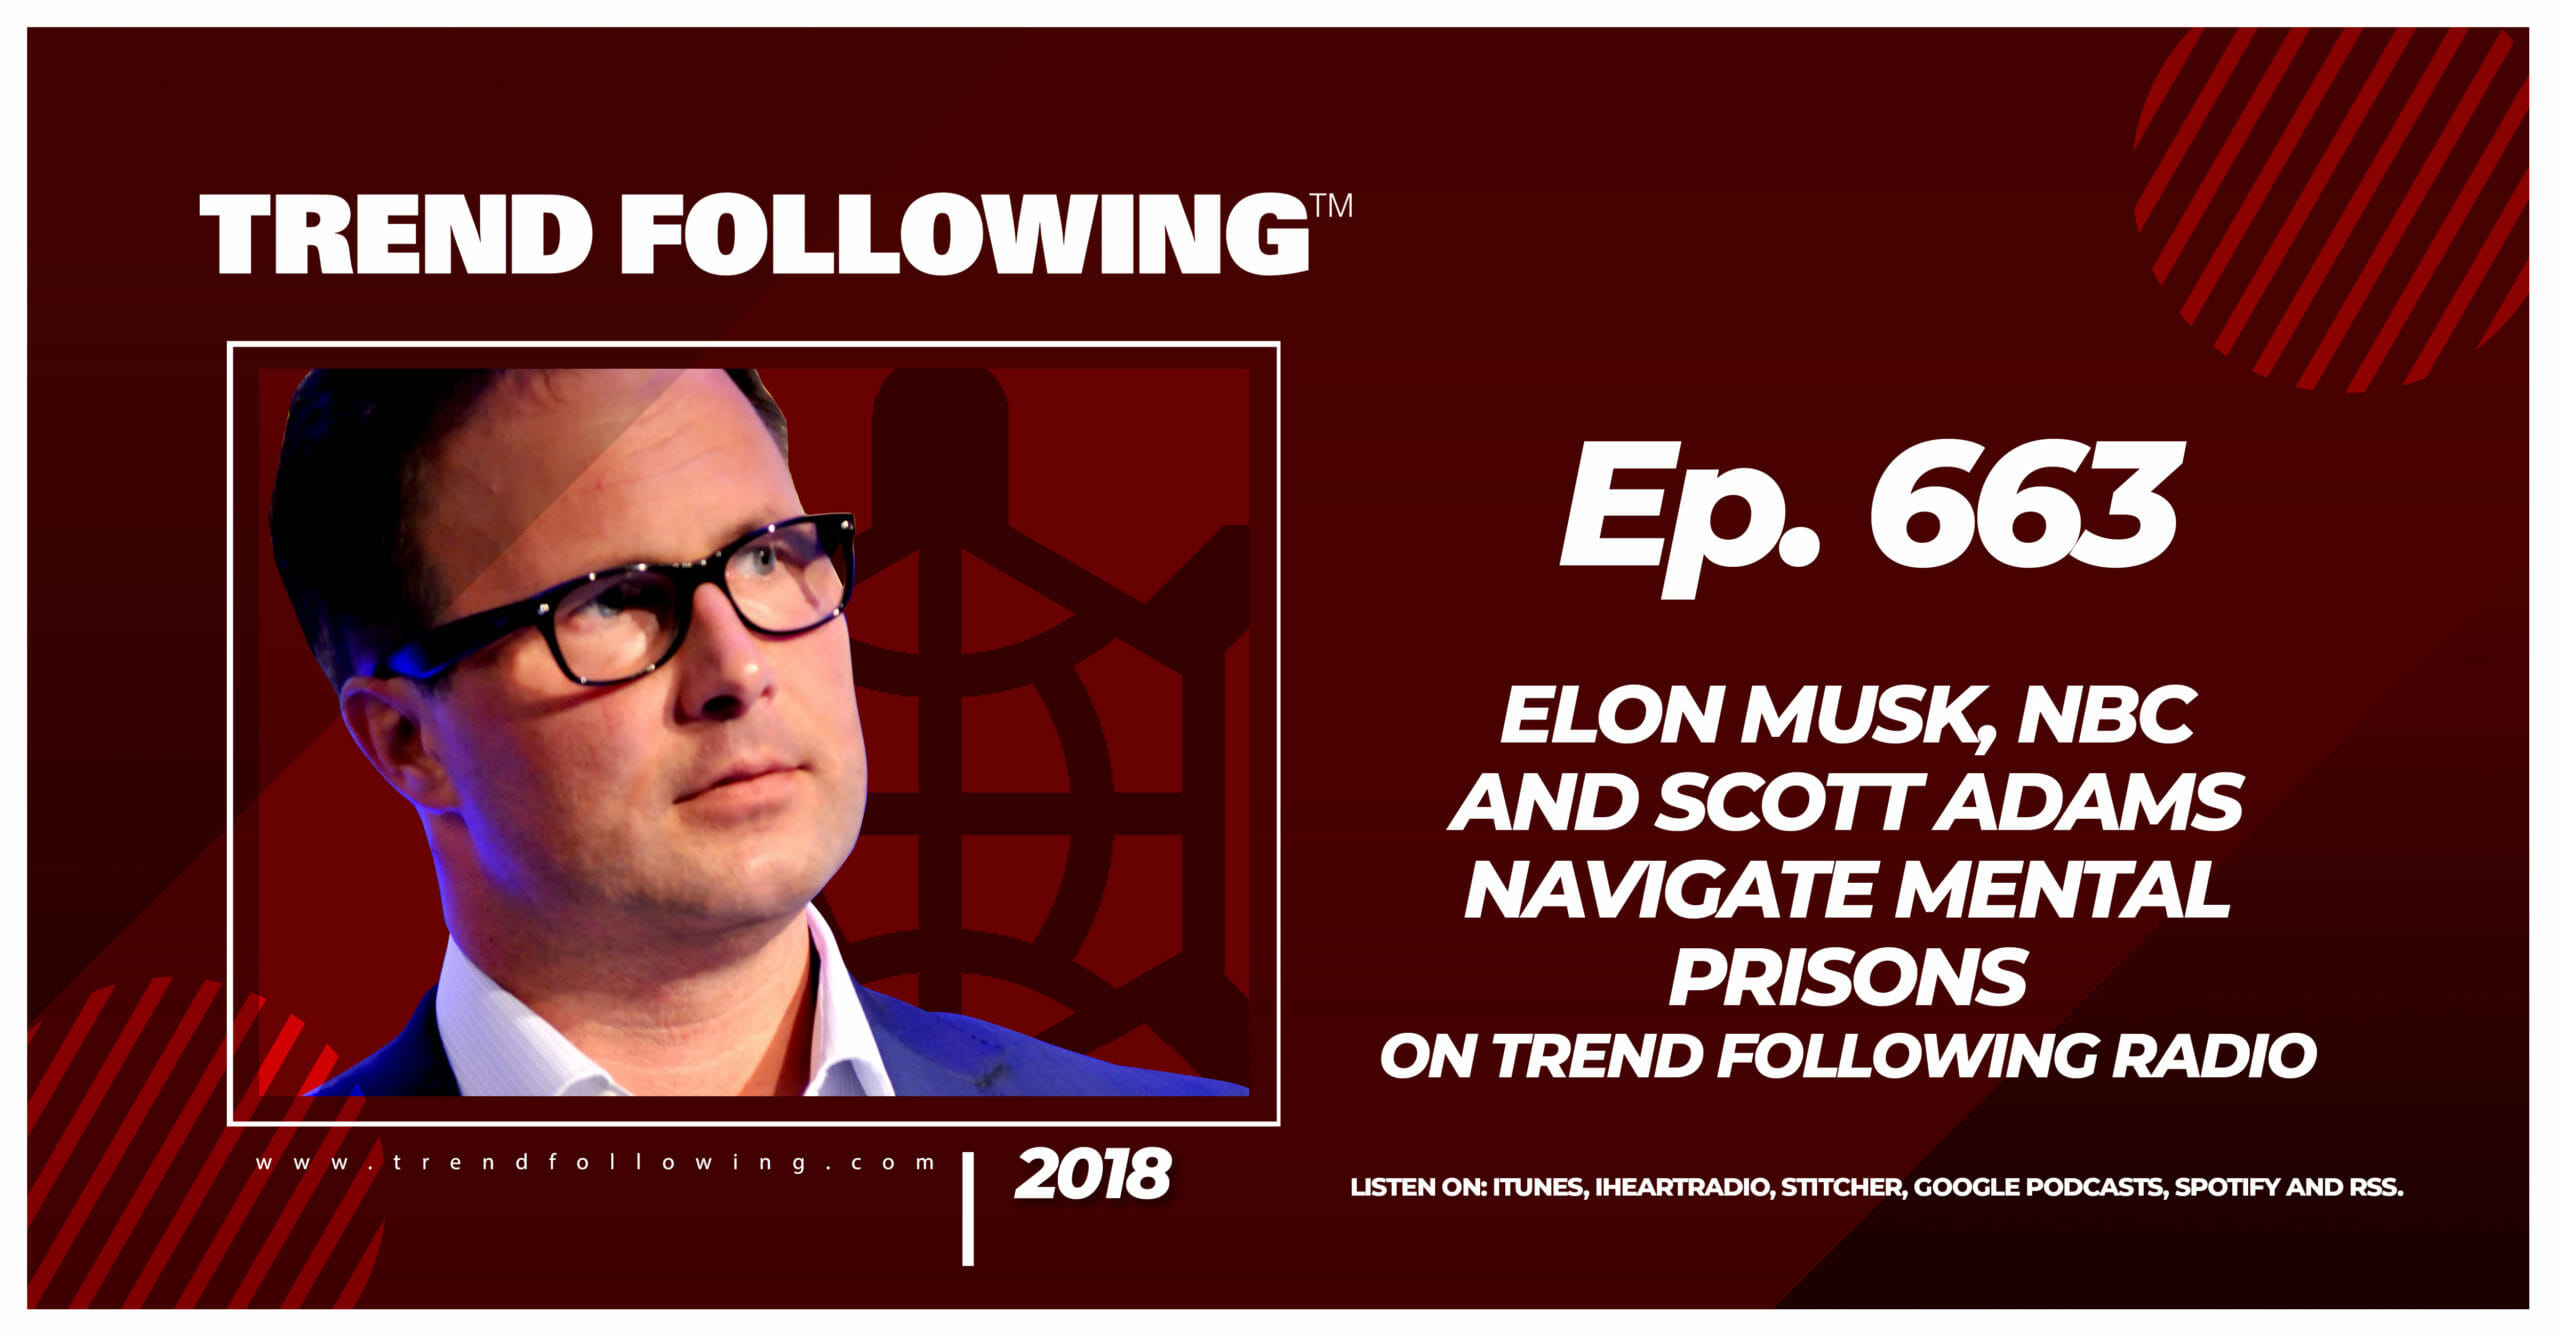 Elon Musk, NBC and Scott Adams Navigate Mental Prisons